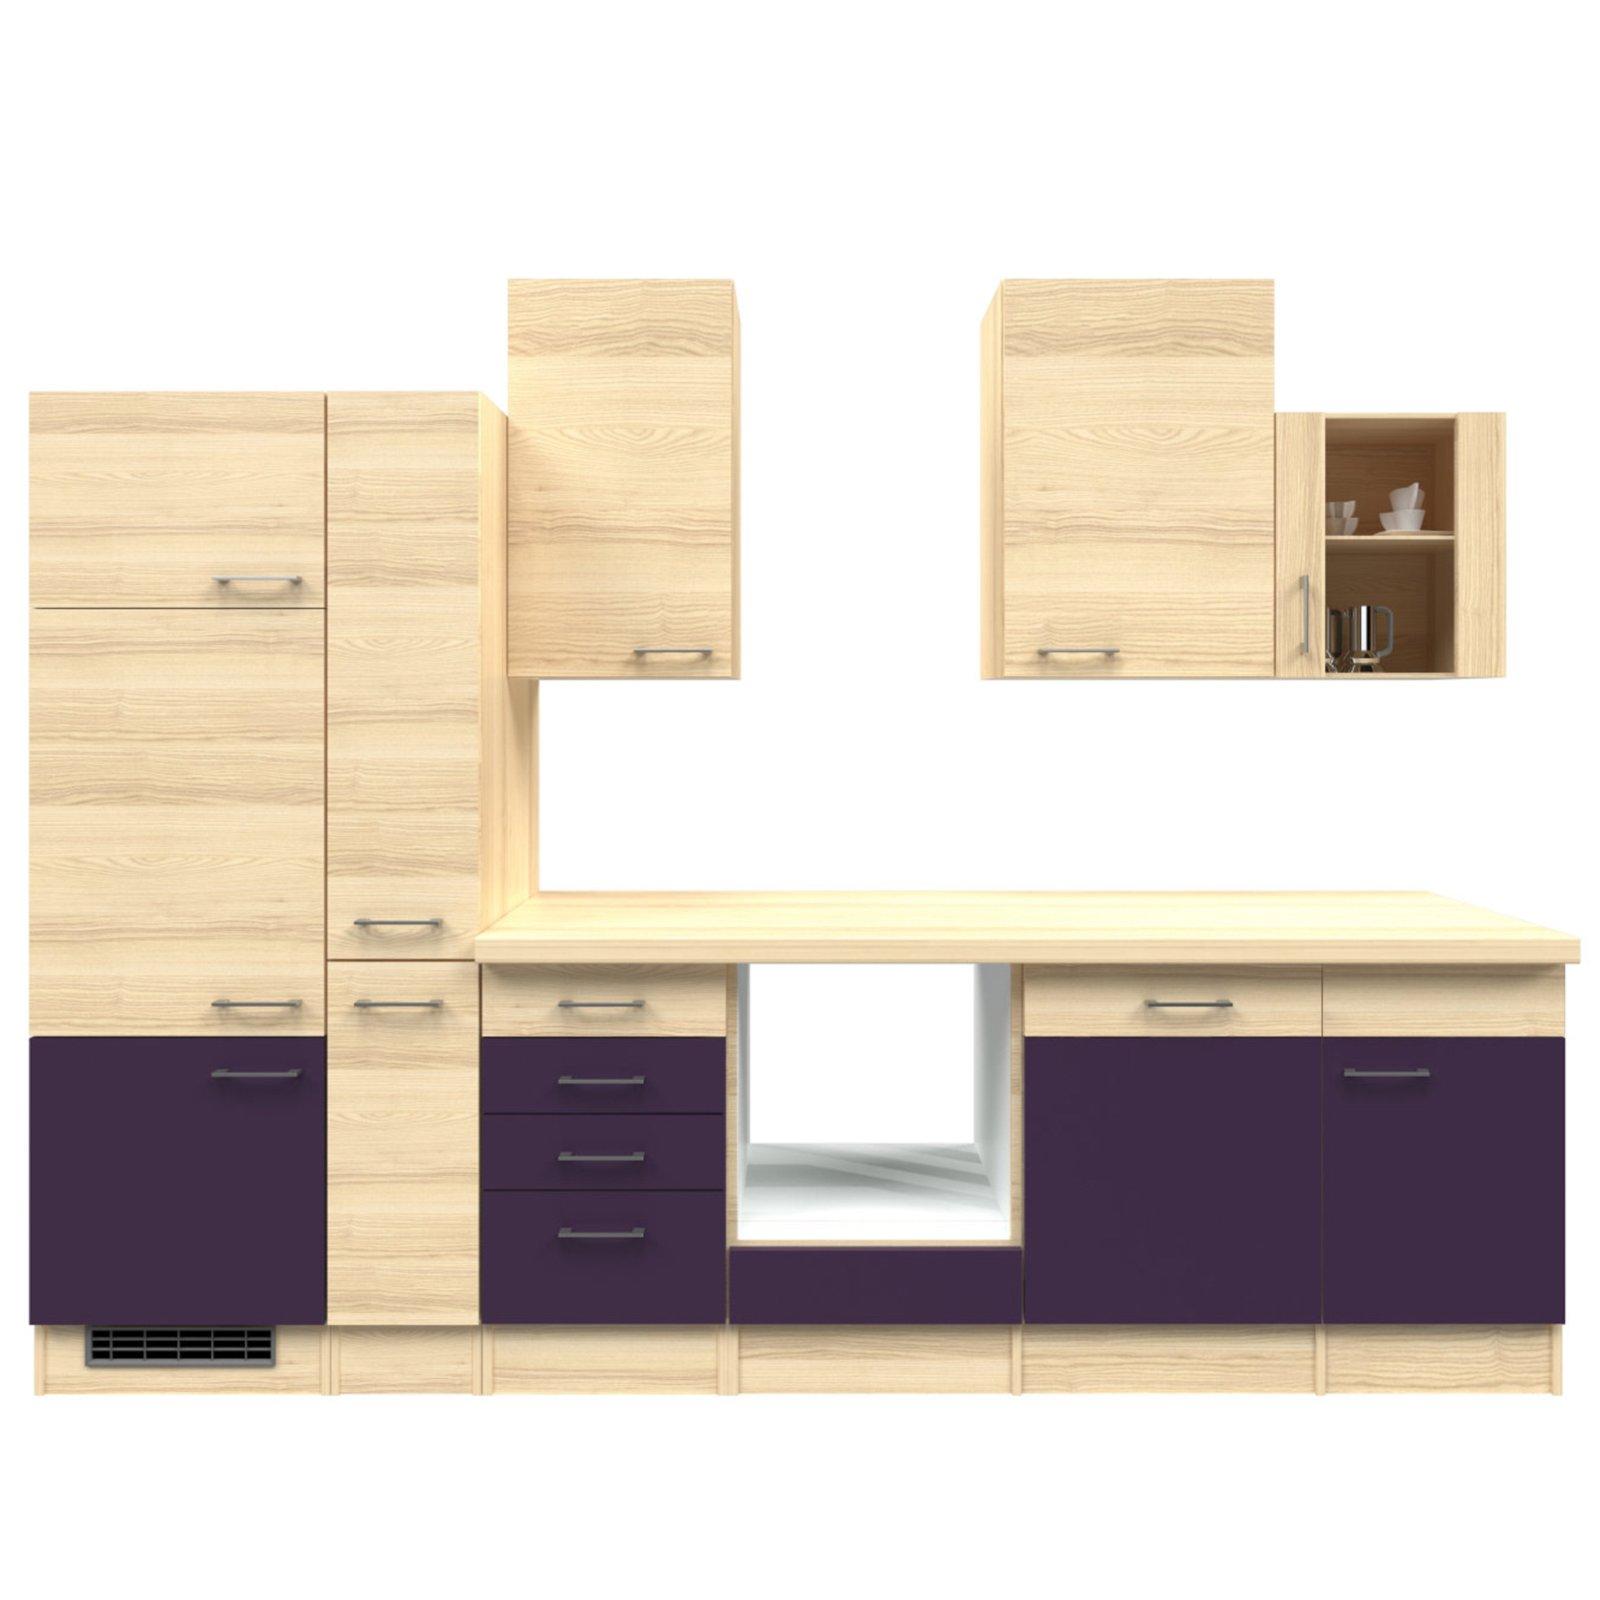 k chenblock focus akazie aubergine 310 cm. Black Bedroom Furniture Sets. Home Design Ideas